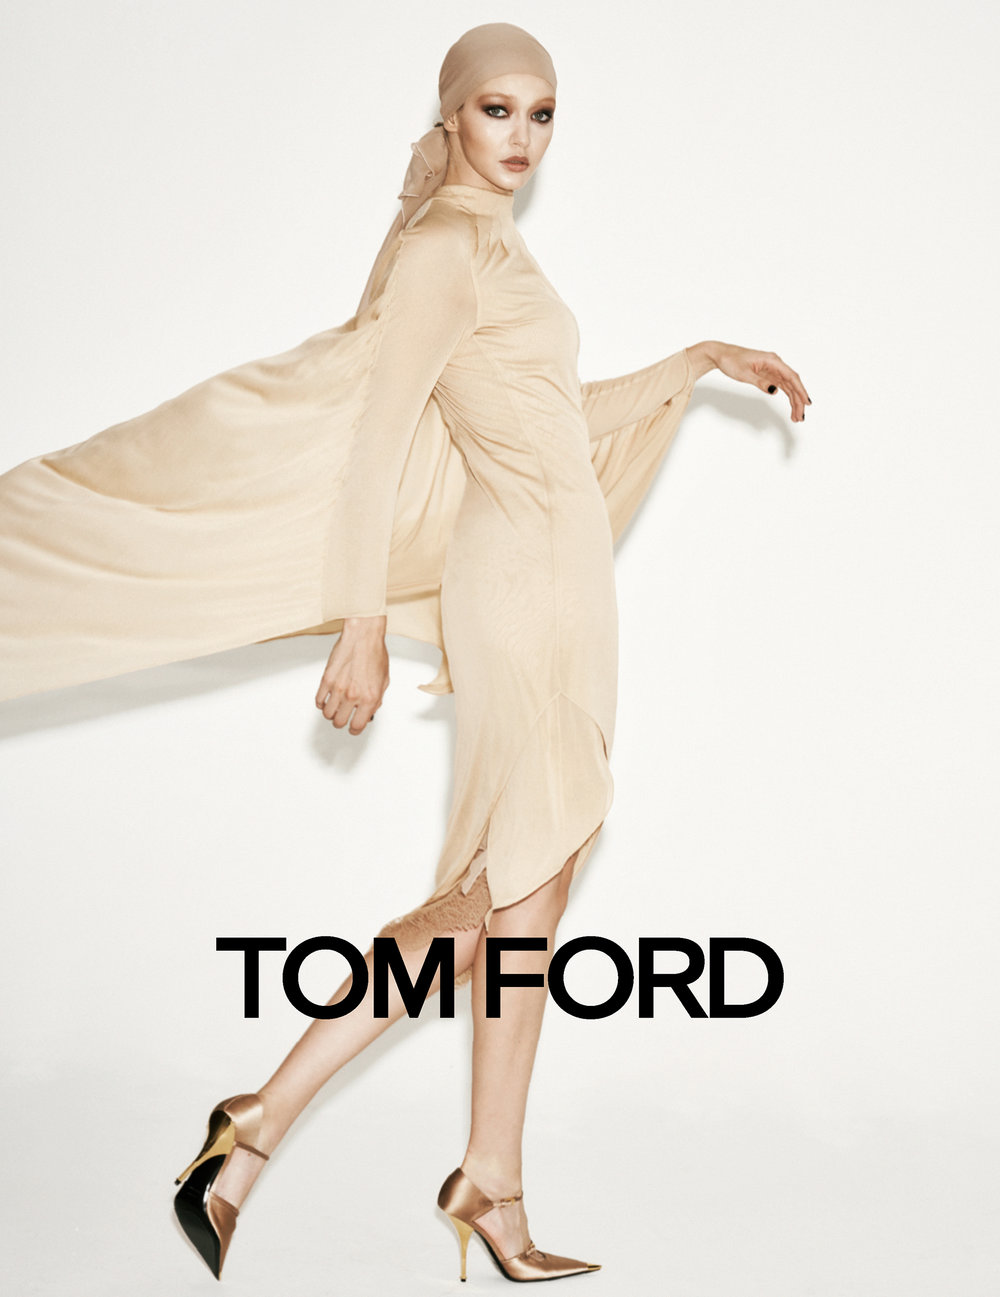 tom_ford_spring_2019_campaign21.jpg